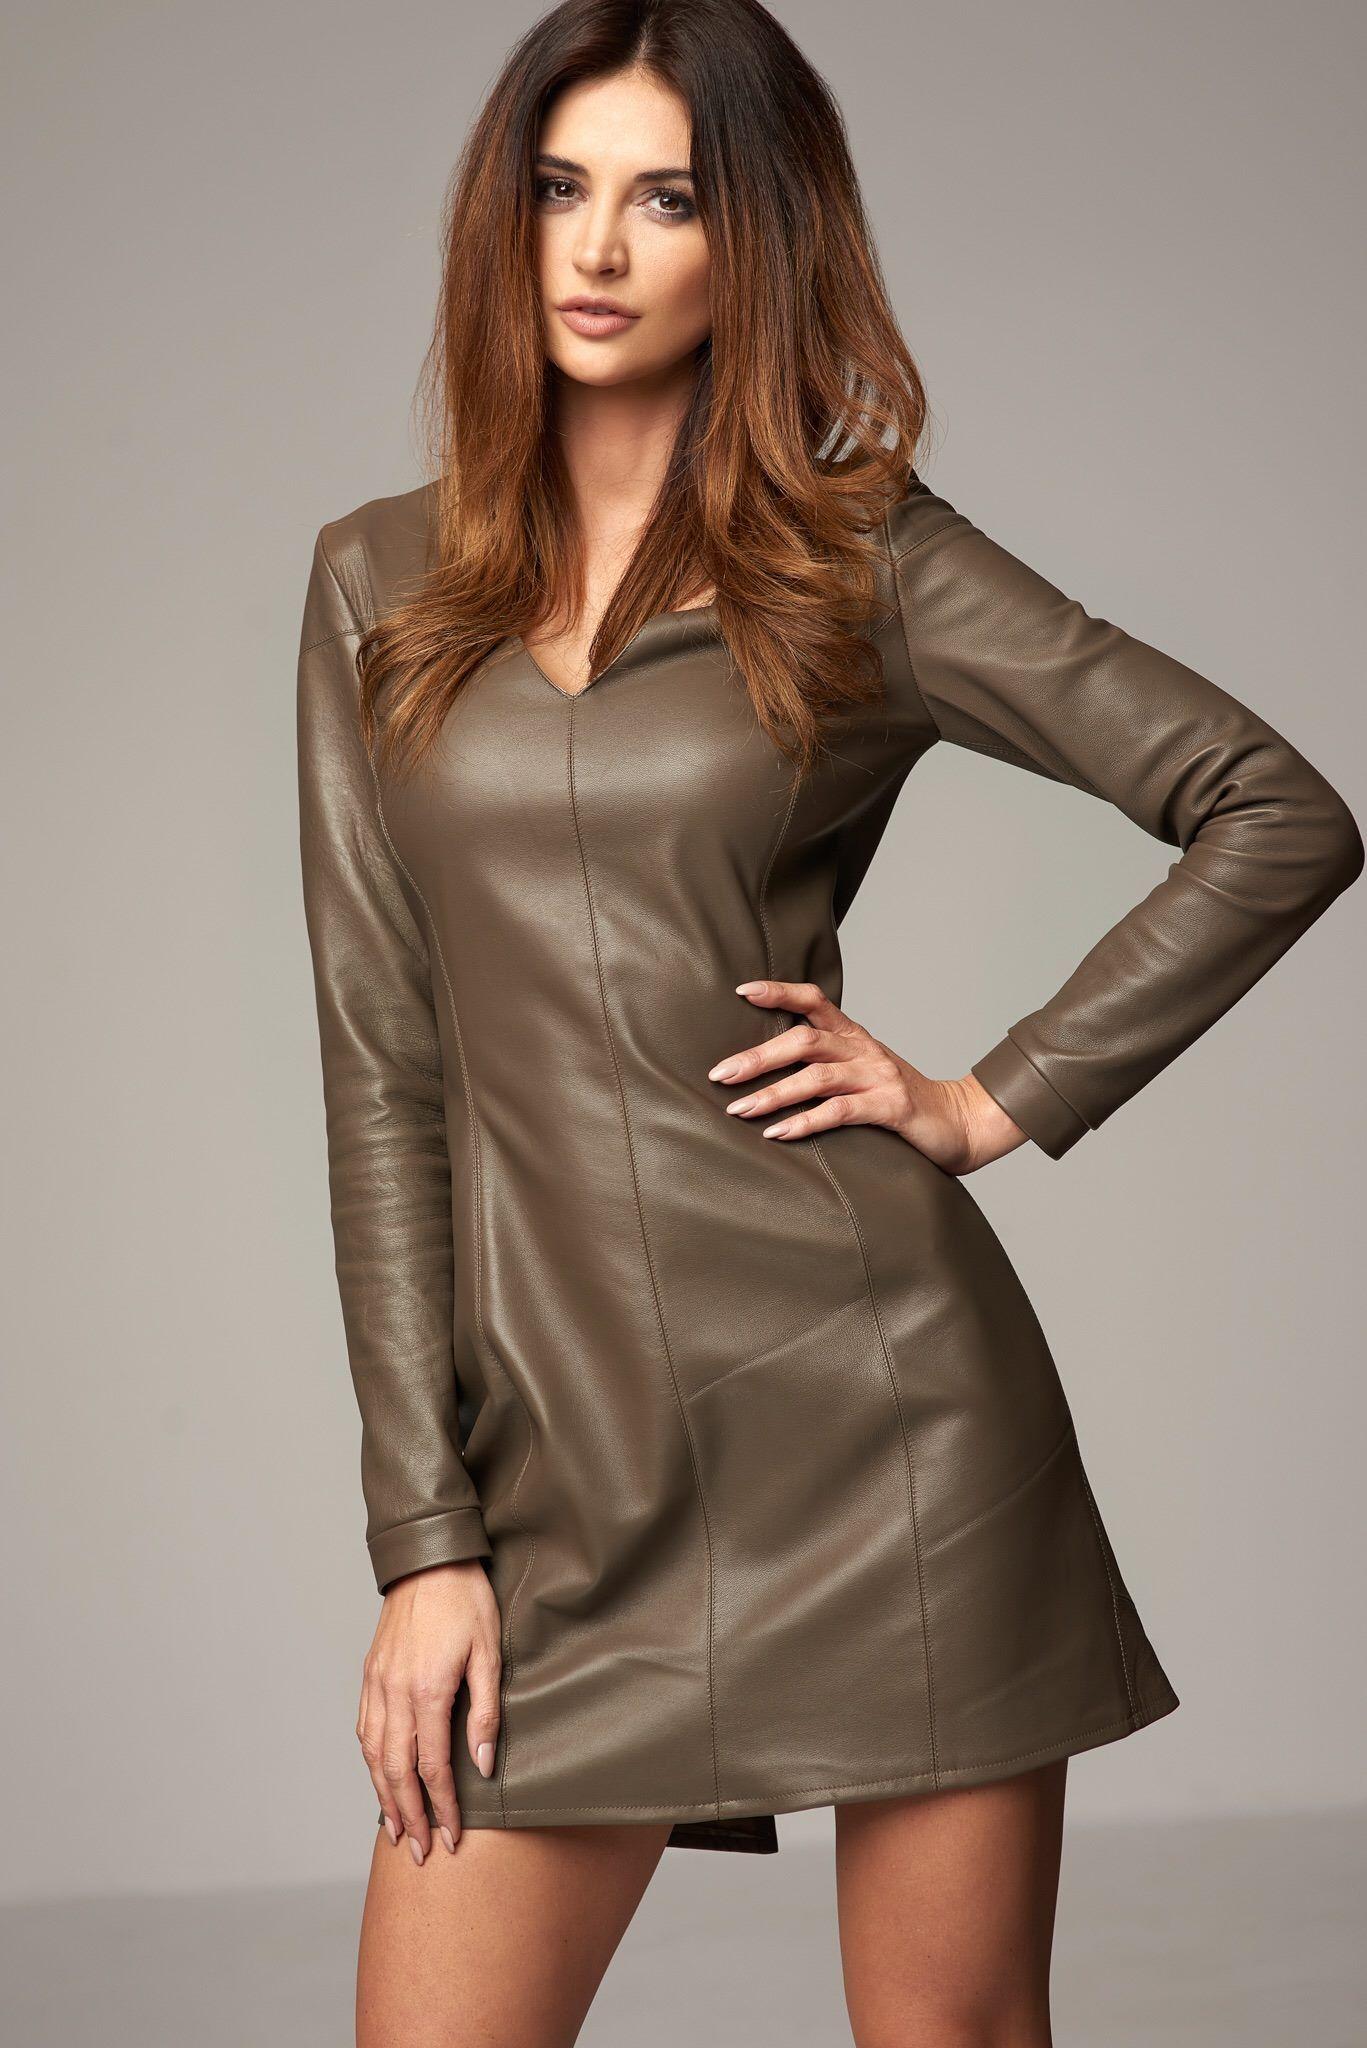 Wioleta Budnik-Juhlke photoshoot for Mojry Natural Leather ...